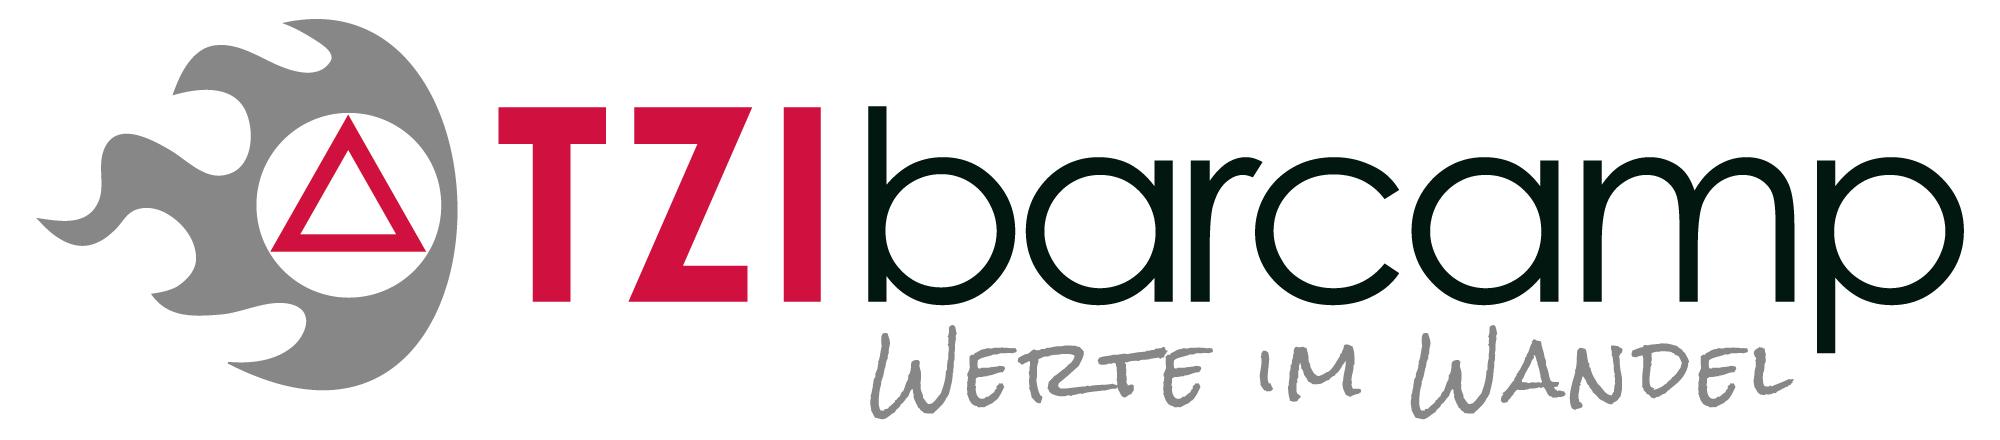 TZI BarCamp